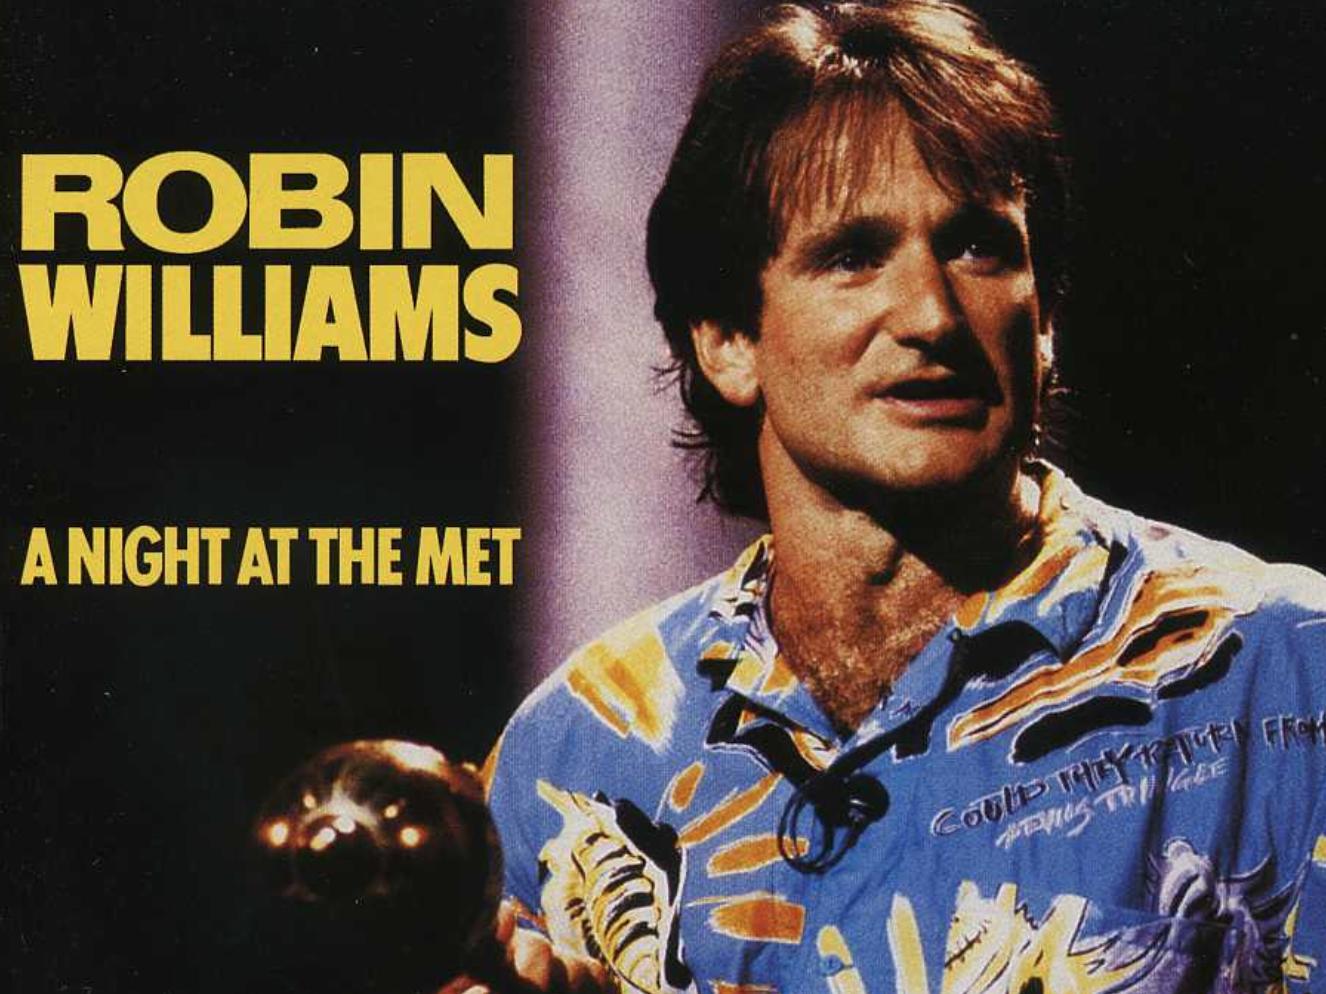 Robin Williams, Inspiration and Depression